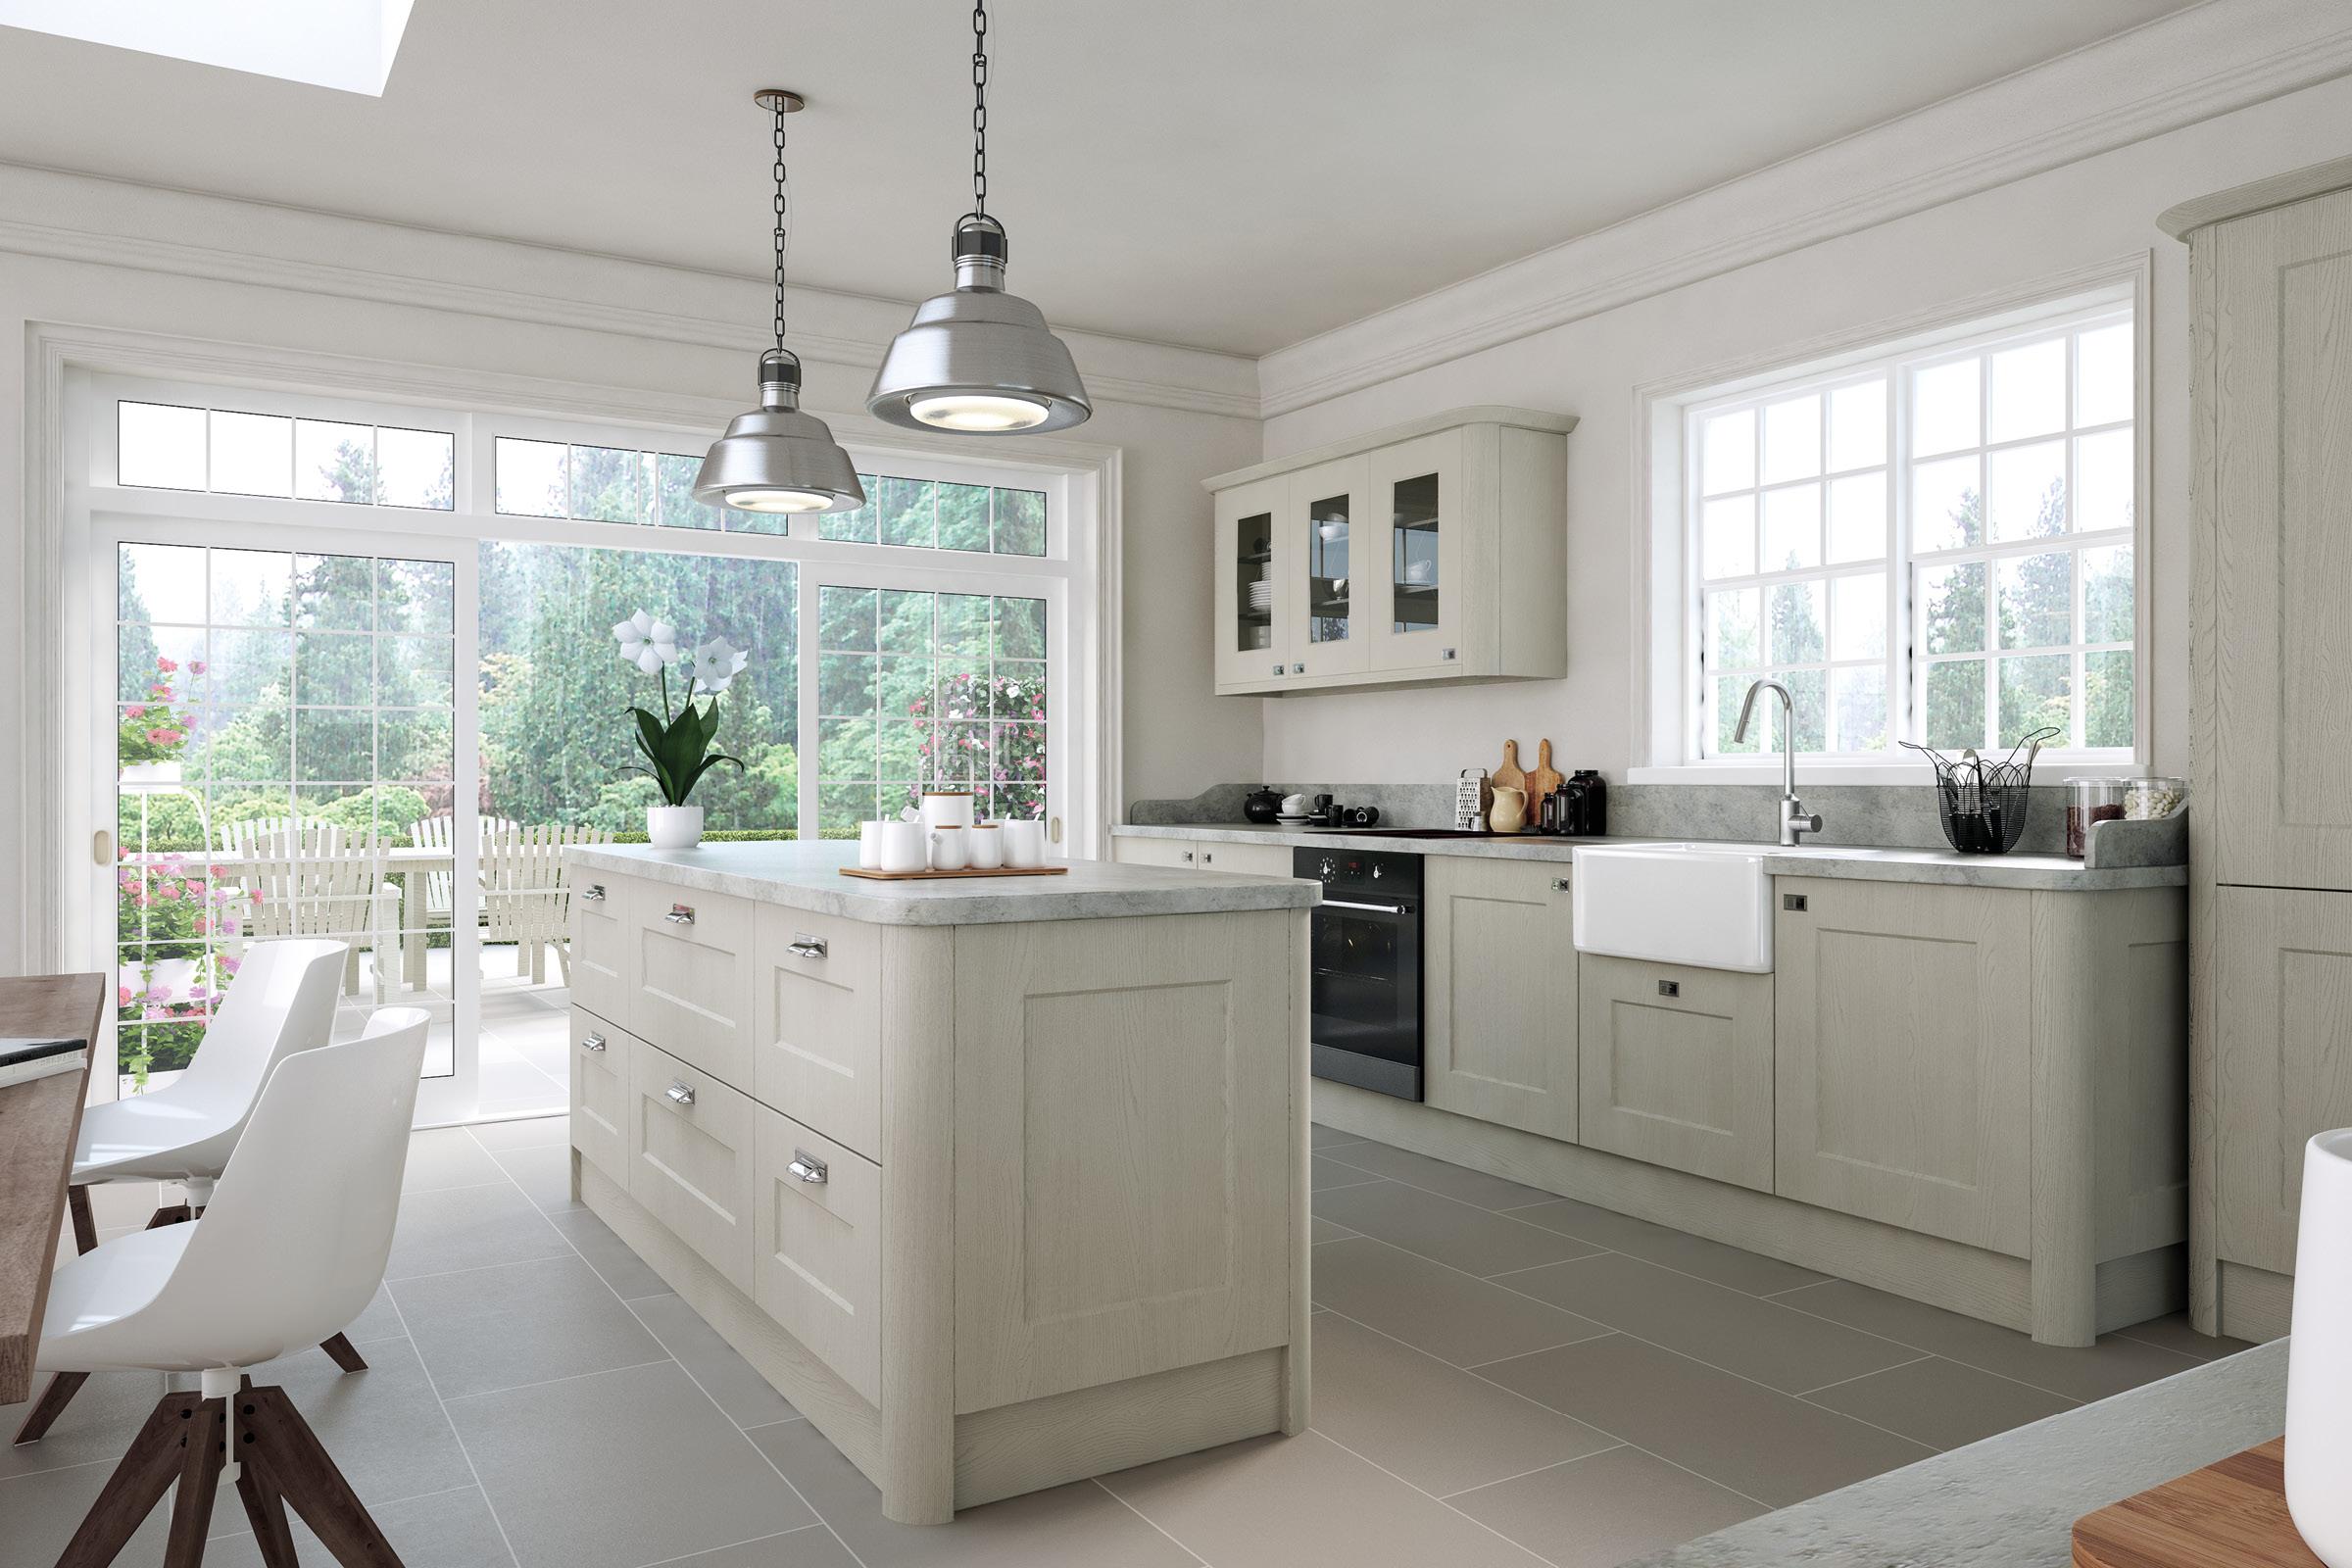 Bella Oakgrain Grey / Style: Cambridge